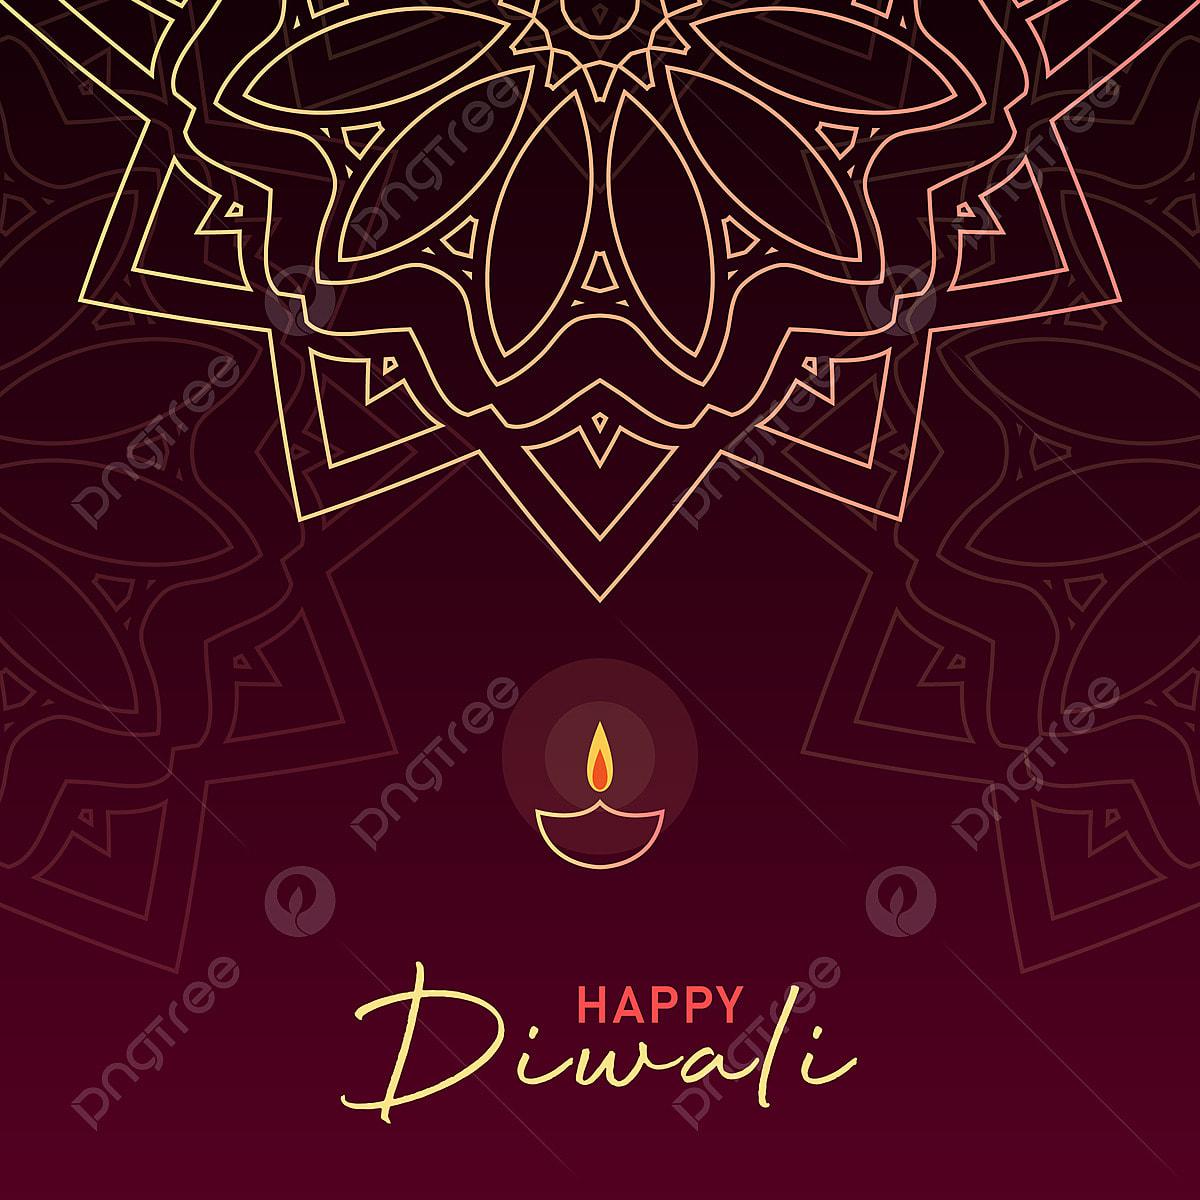 Simple And Elegant Line Art Happy Diwali Vector Design Simple Lineart Diwali Png And Vector With Transparent Background For Free Download,Teenage Girl Latest Bridal Lehenga Designs 2020 For Wedding